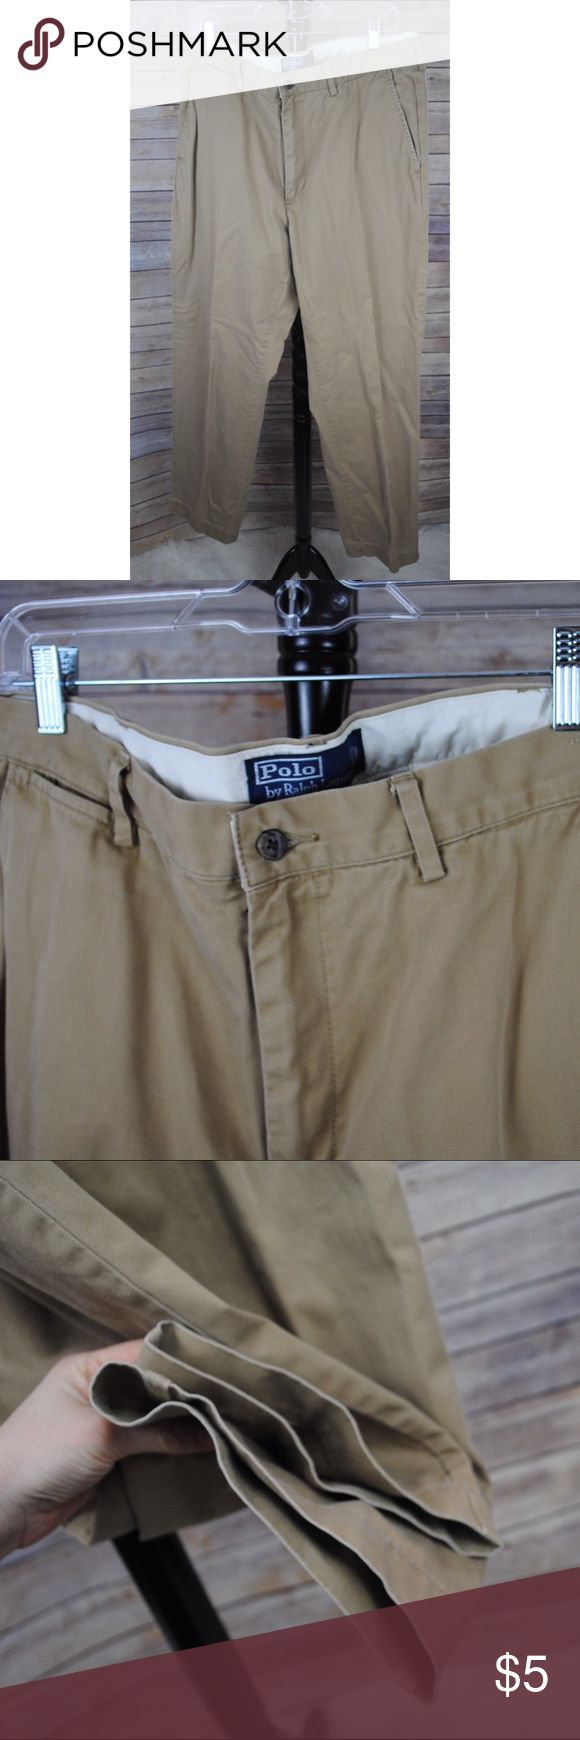 Men's 36/34 Khaki Slacks Khaki slacks. Please see small pin hole in the waistband. Polo by Ralph Lauren Pants Chinos & Khakis